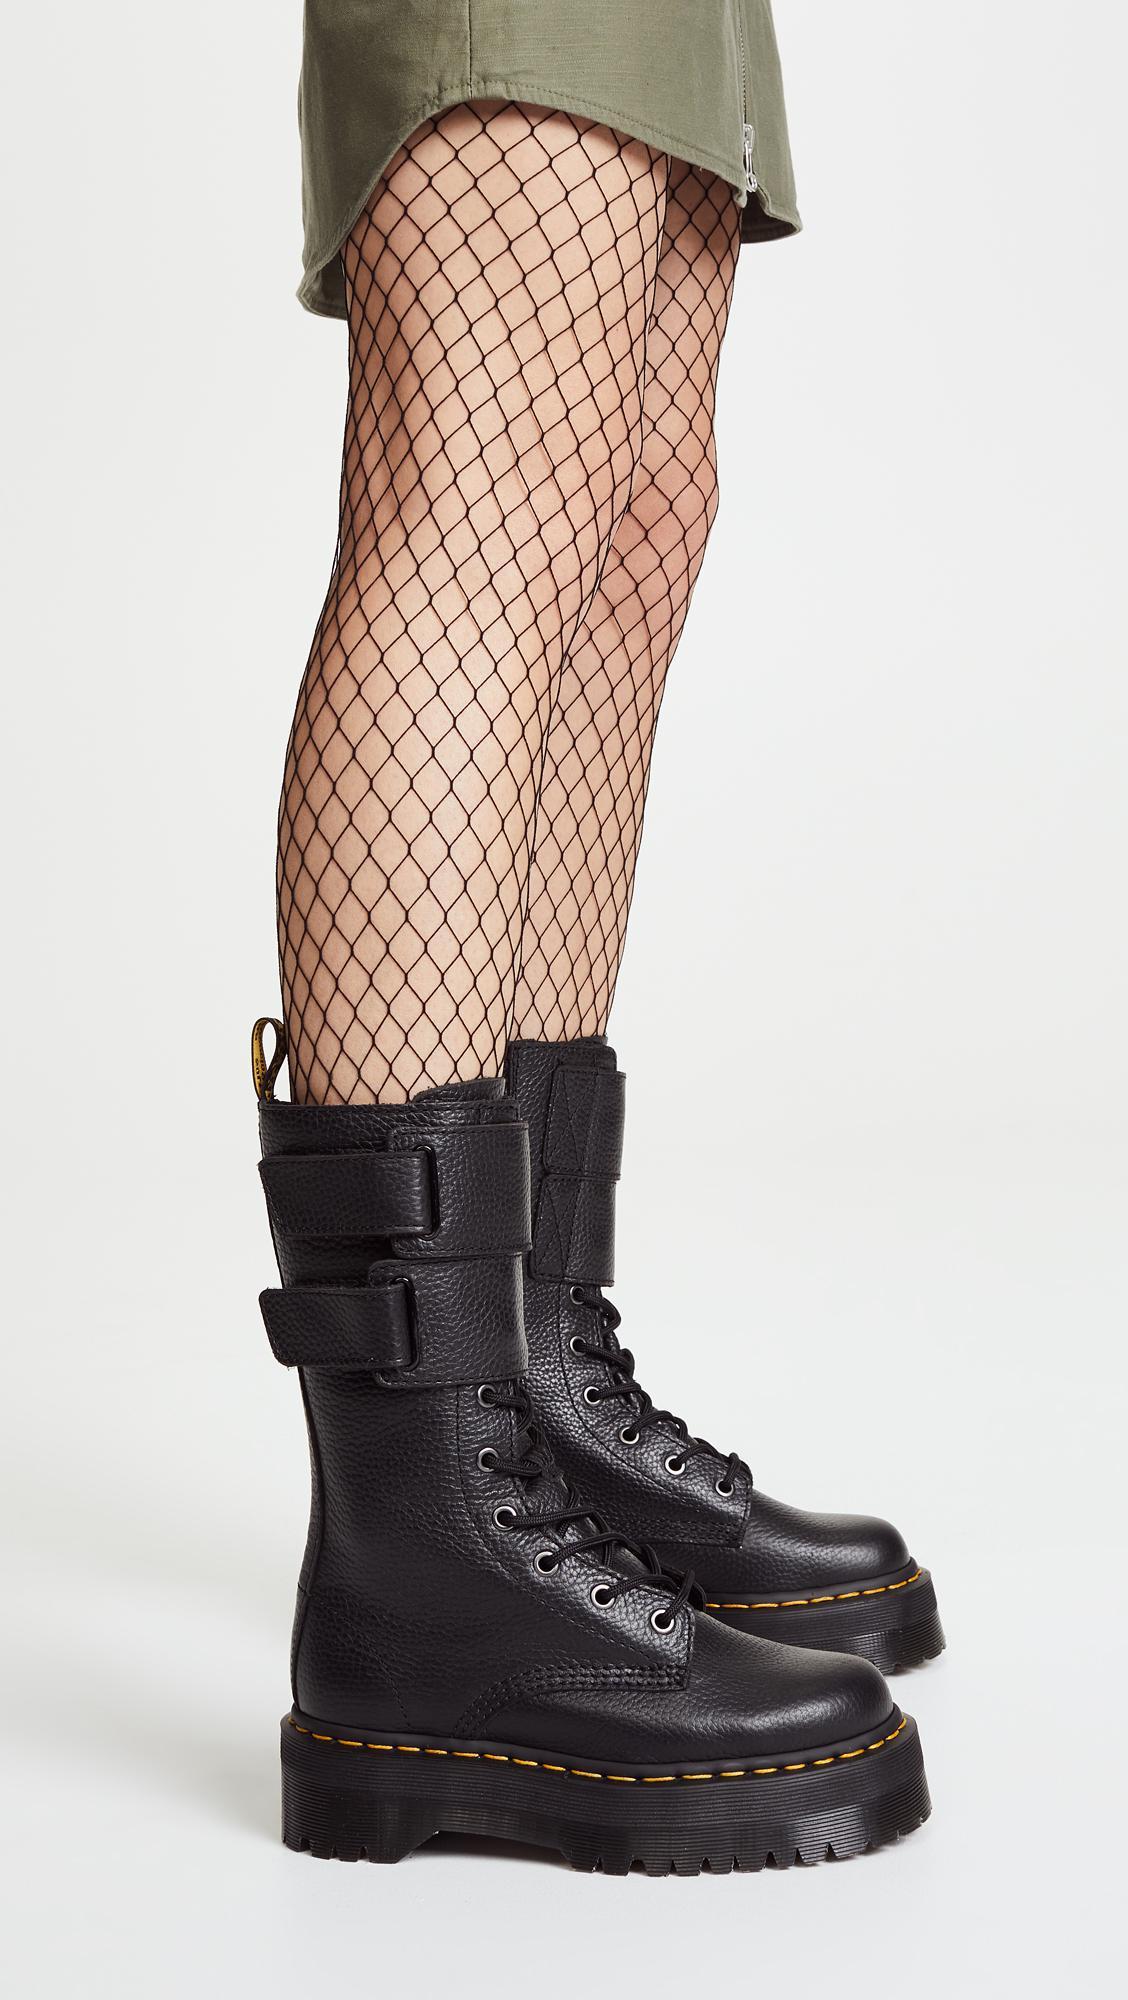 Lyst - Dr. Martens Jagger 10 Eye Boots in Black ea96bb5550